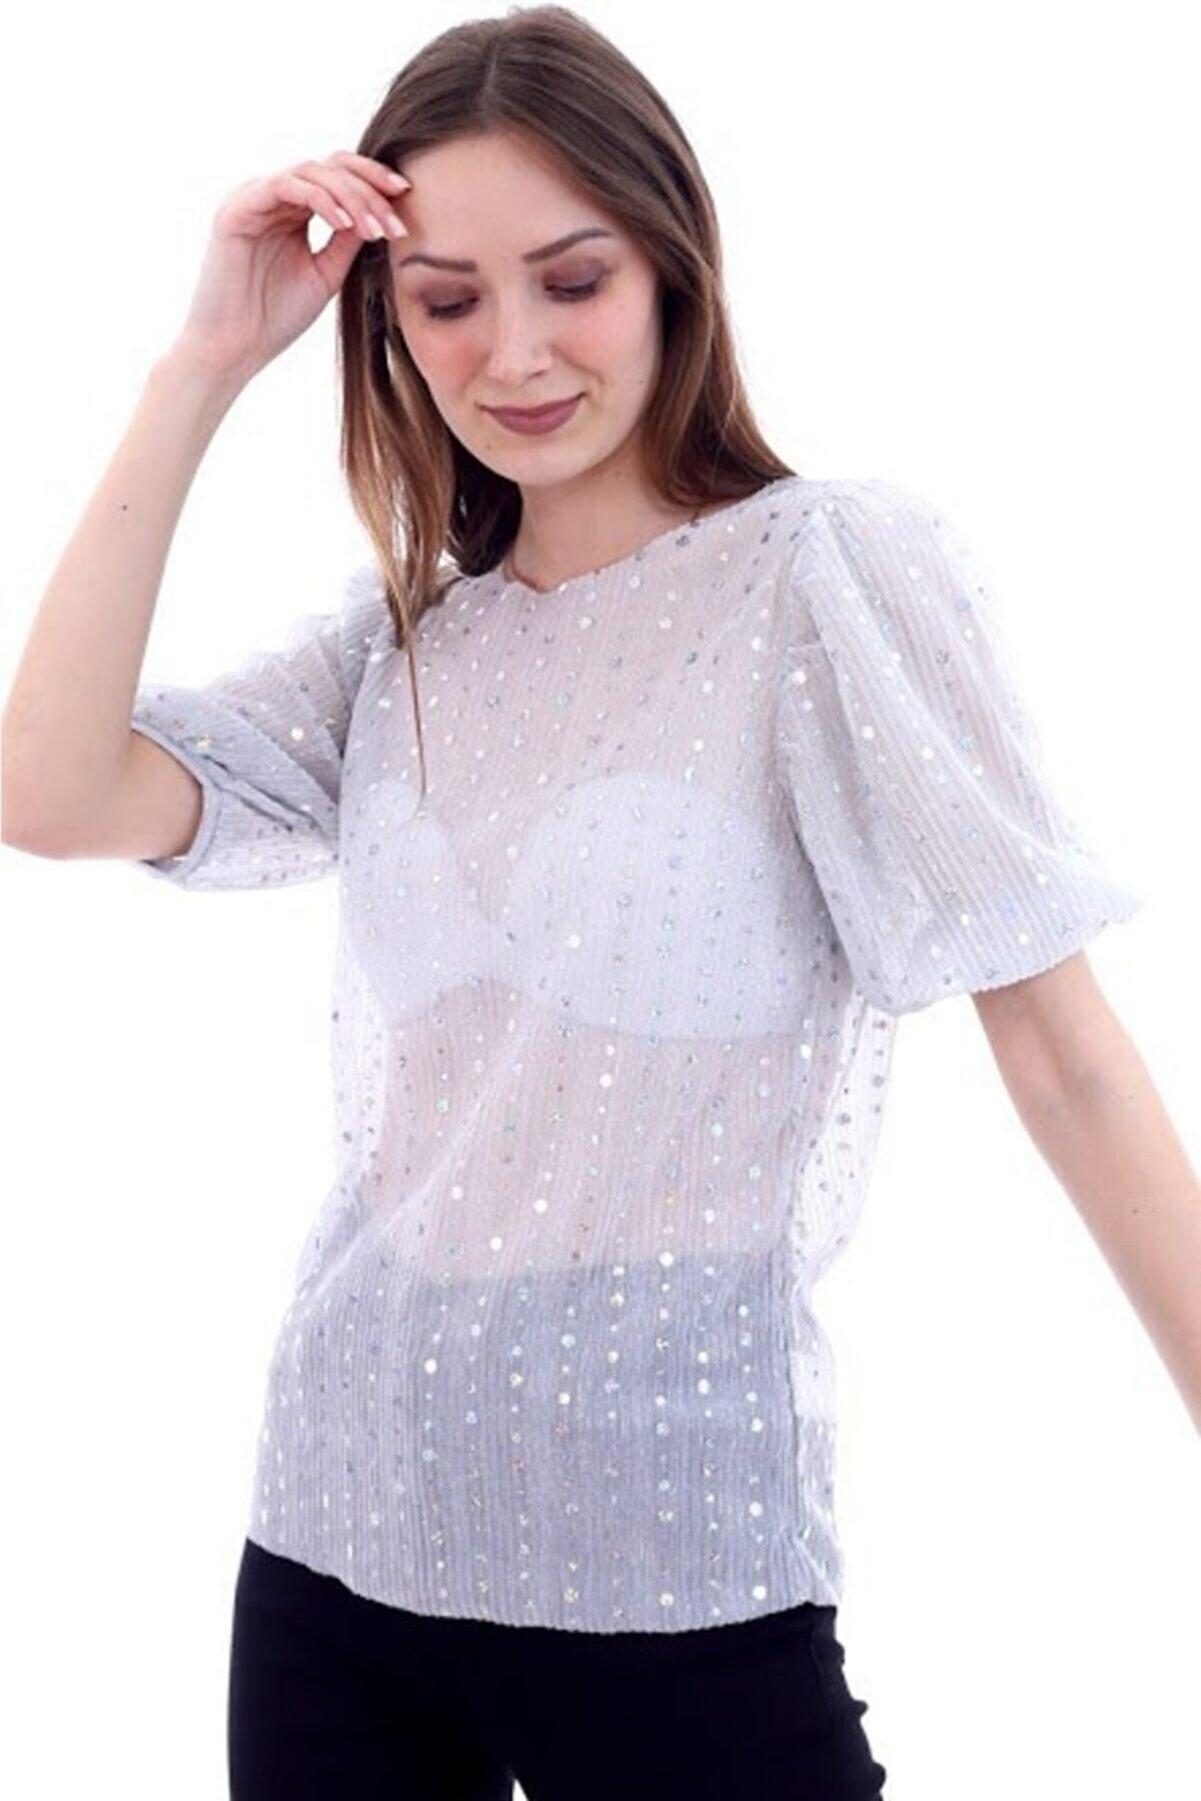 RODNEY Kadın Transparan Pullu Gri Tshirt